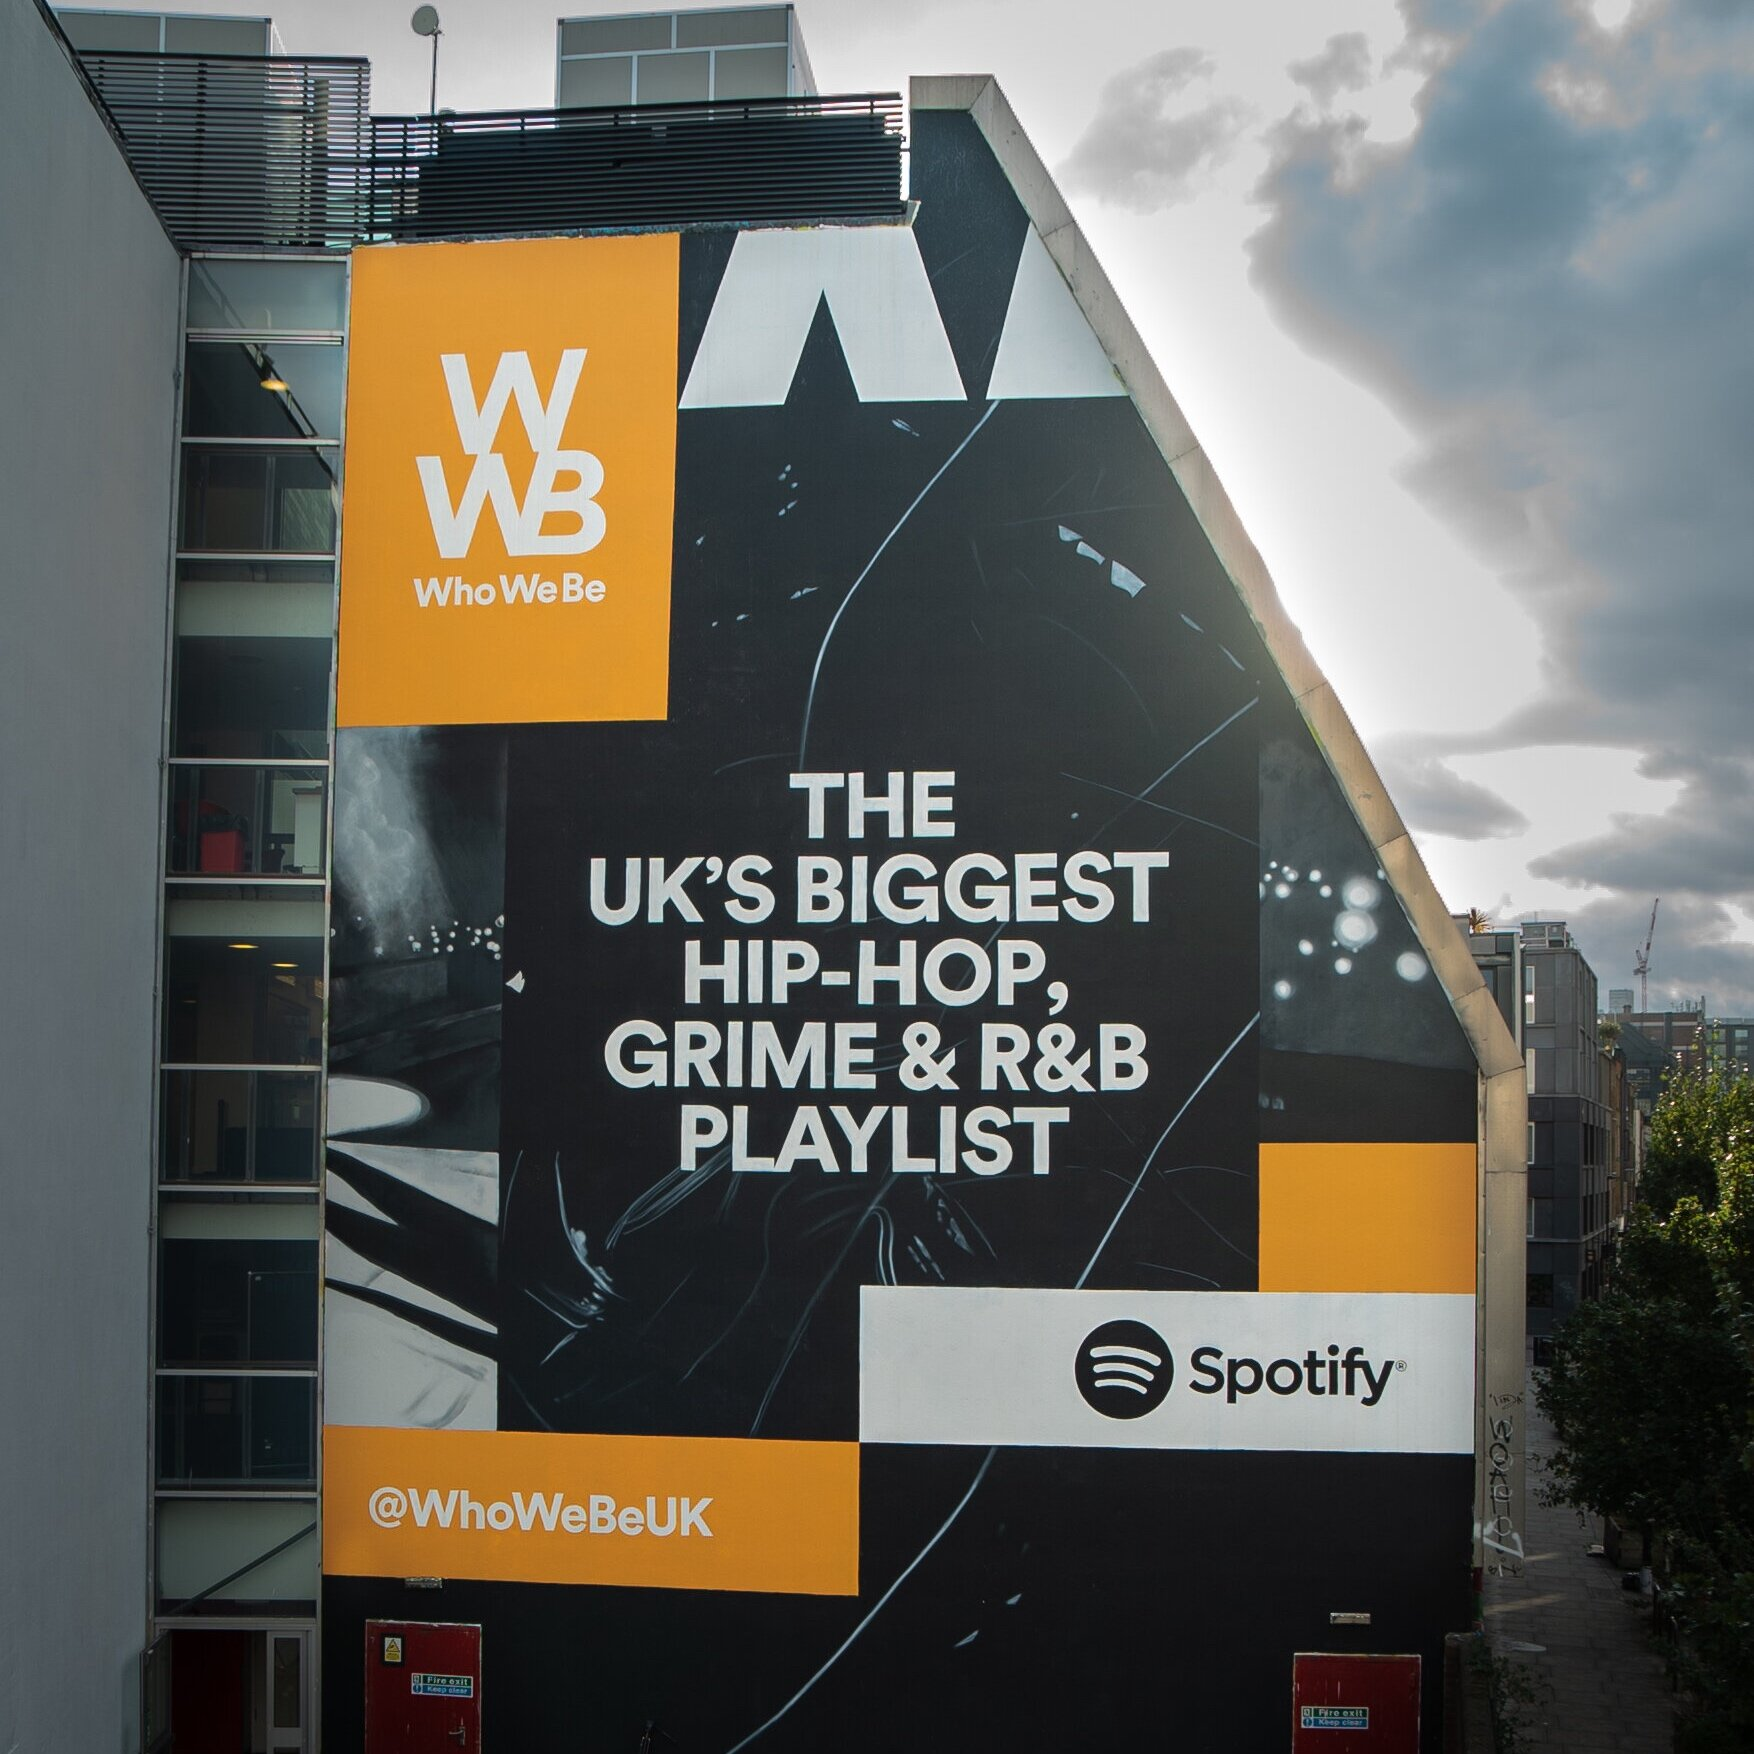 Spotify%2C+Rich+Mix-06744.jpg